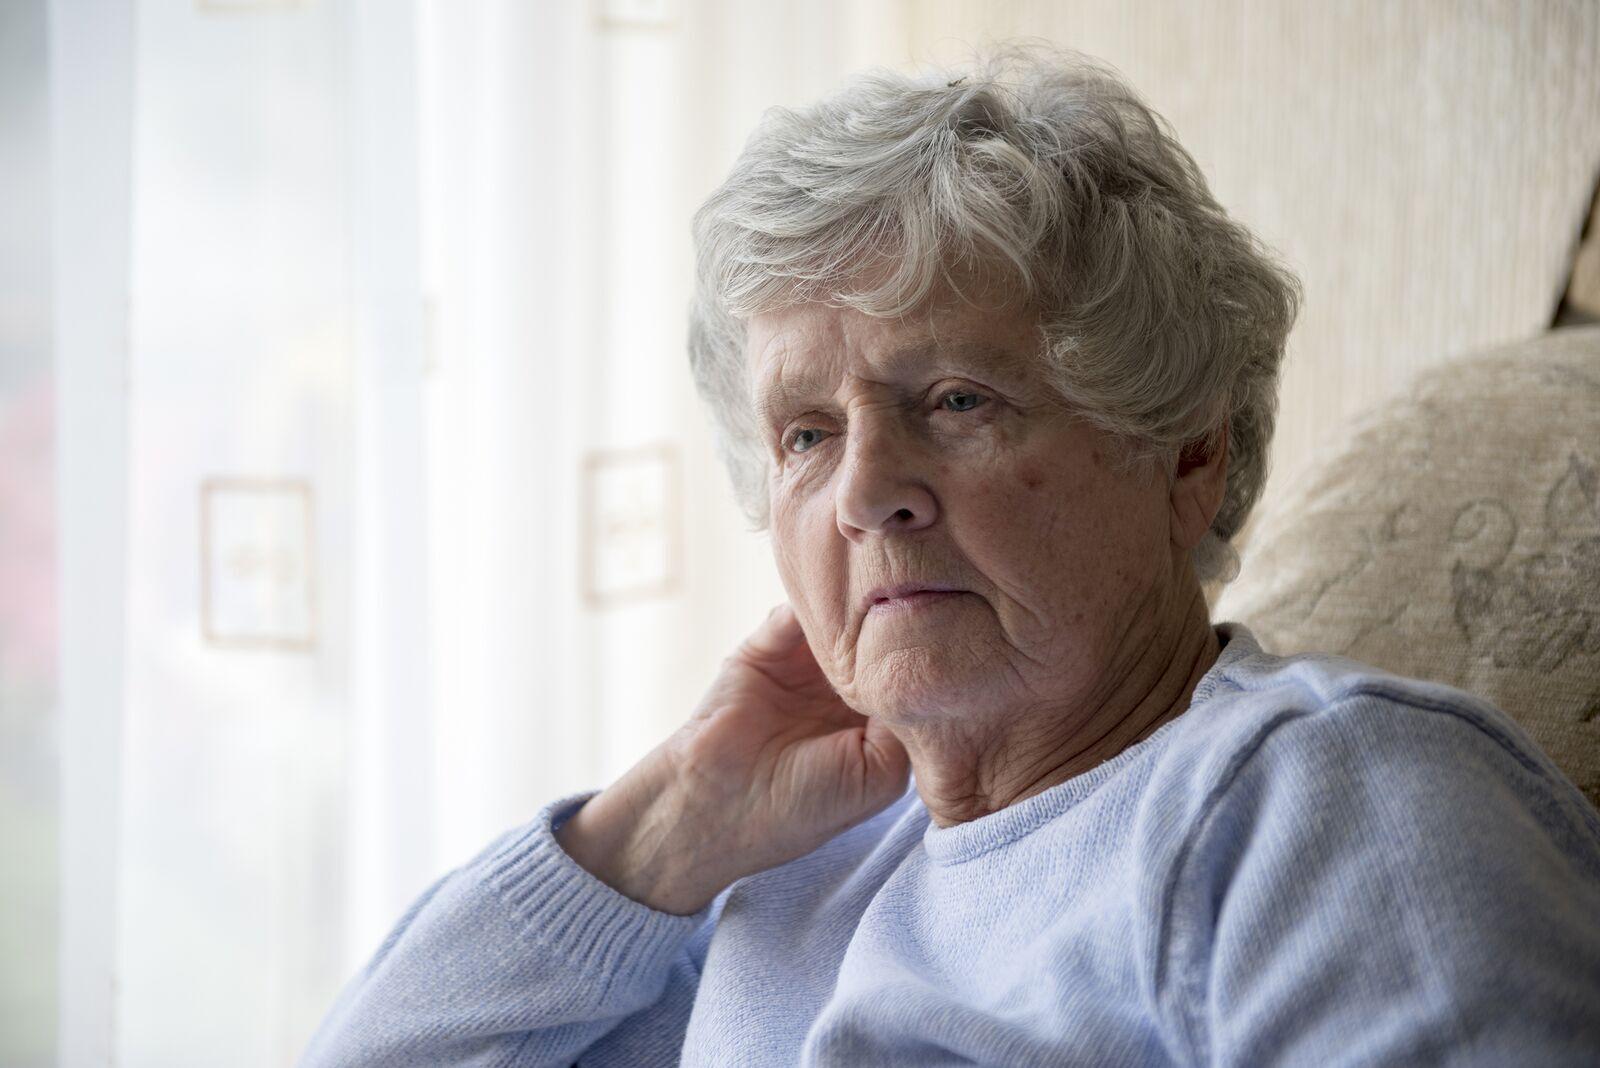 Senior Care in Dacula GA: Bad Mood